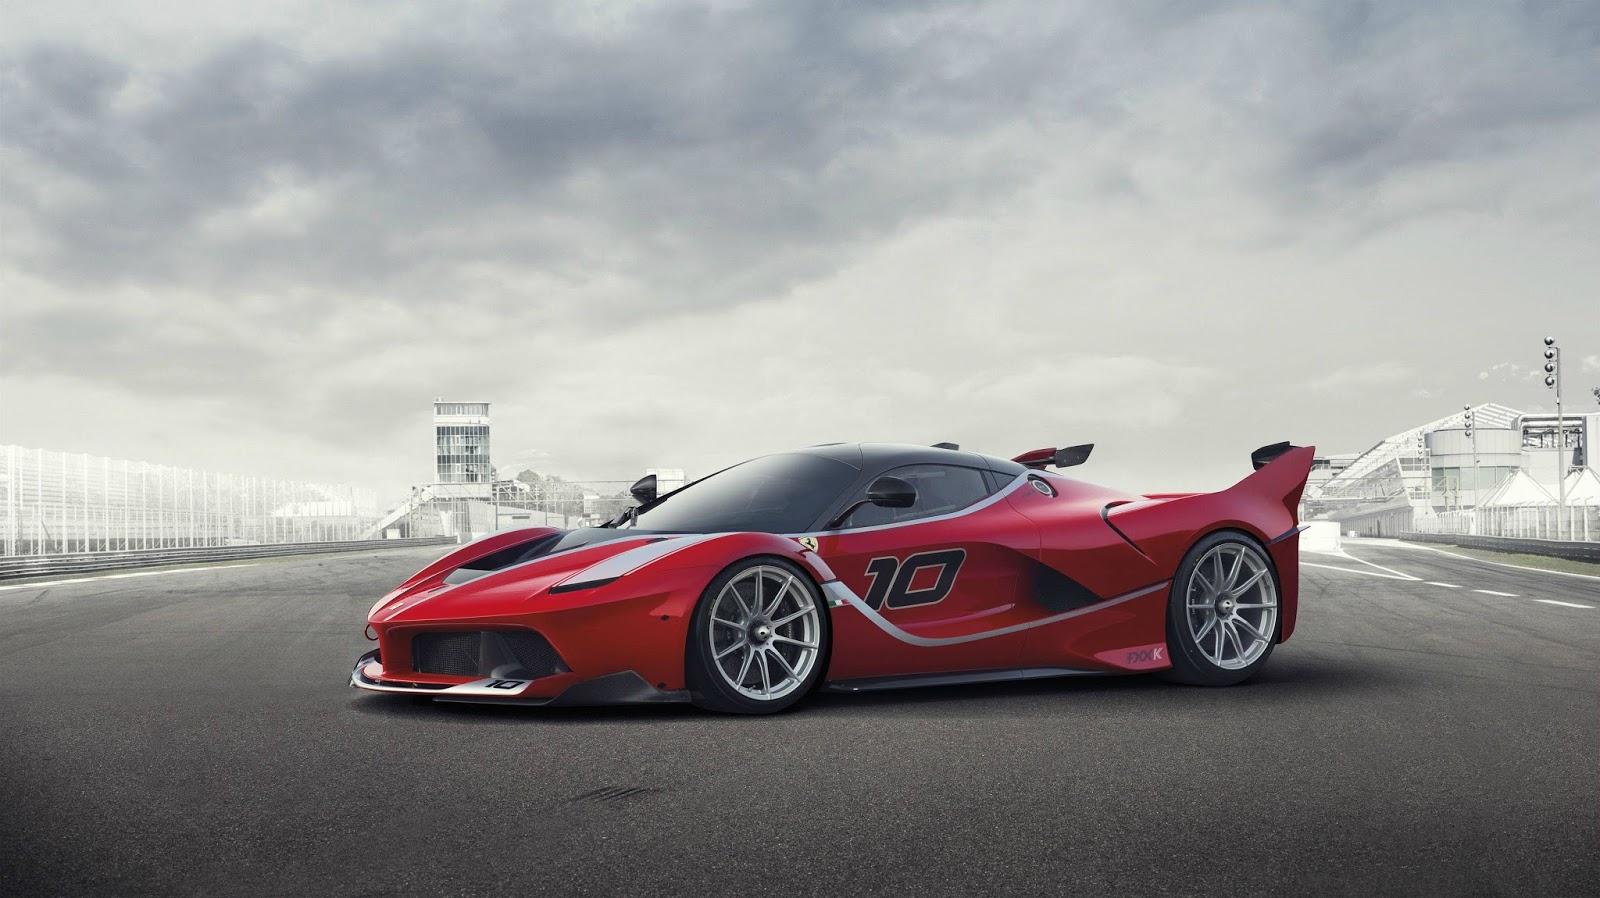 4 Ferrari Fxx ουρλιάζουν στην πίστα Ferrari, Ferrari FXX K, videos